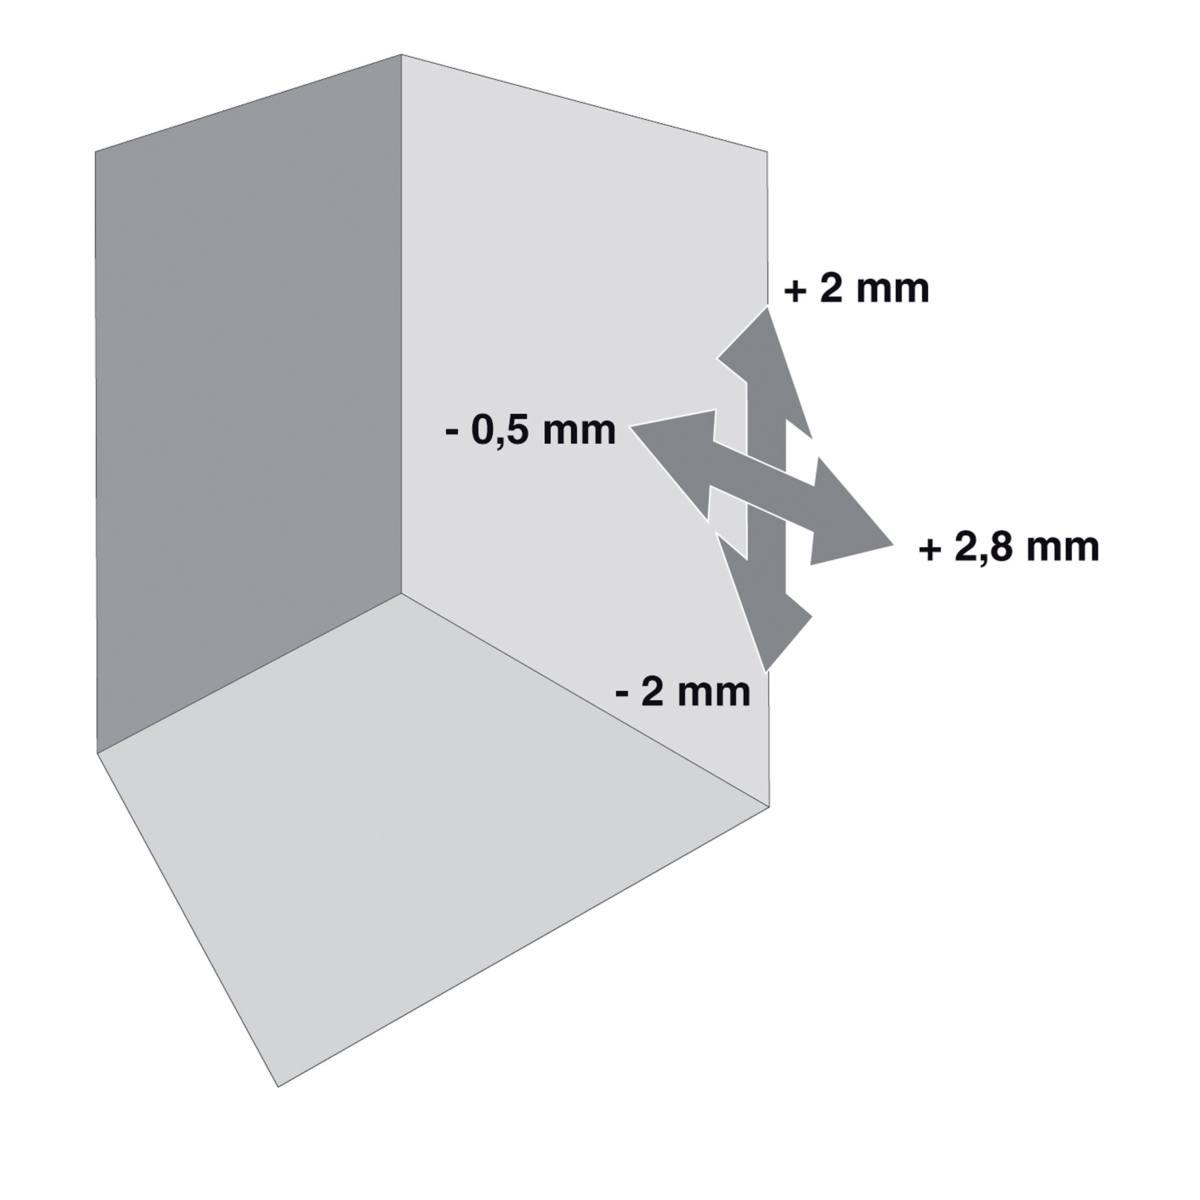 EMBASE CROIX HT : 3 MM DOMI À VISSER